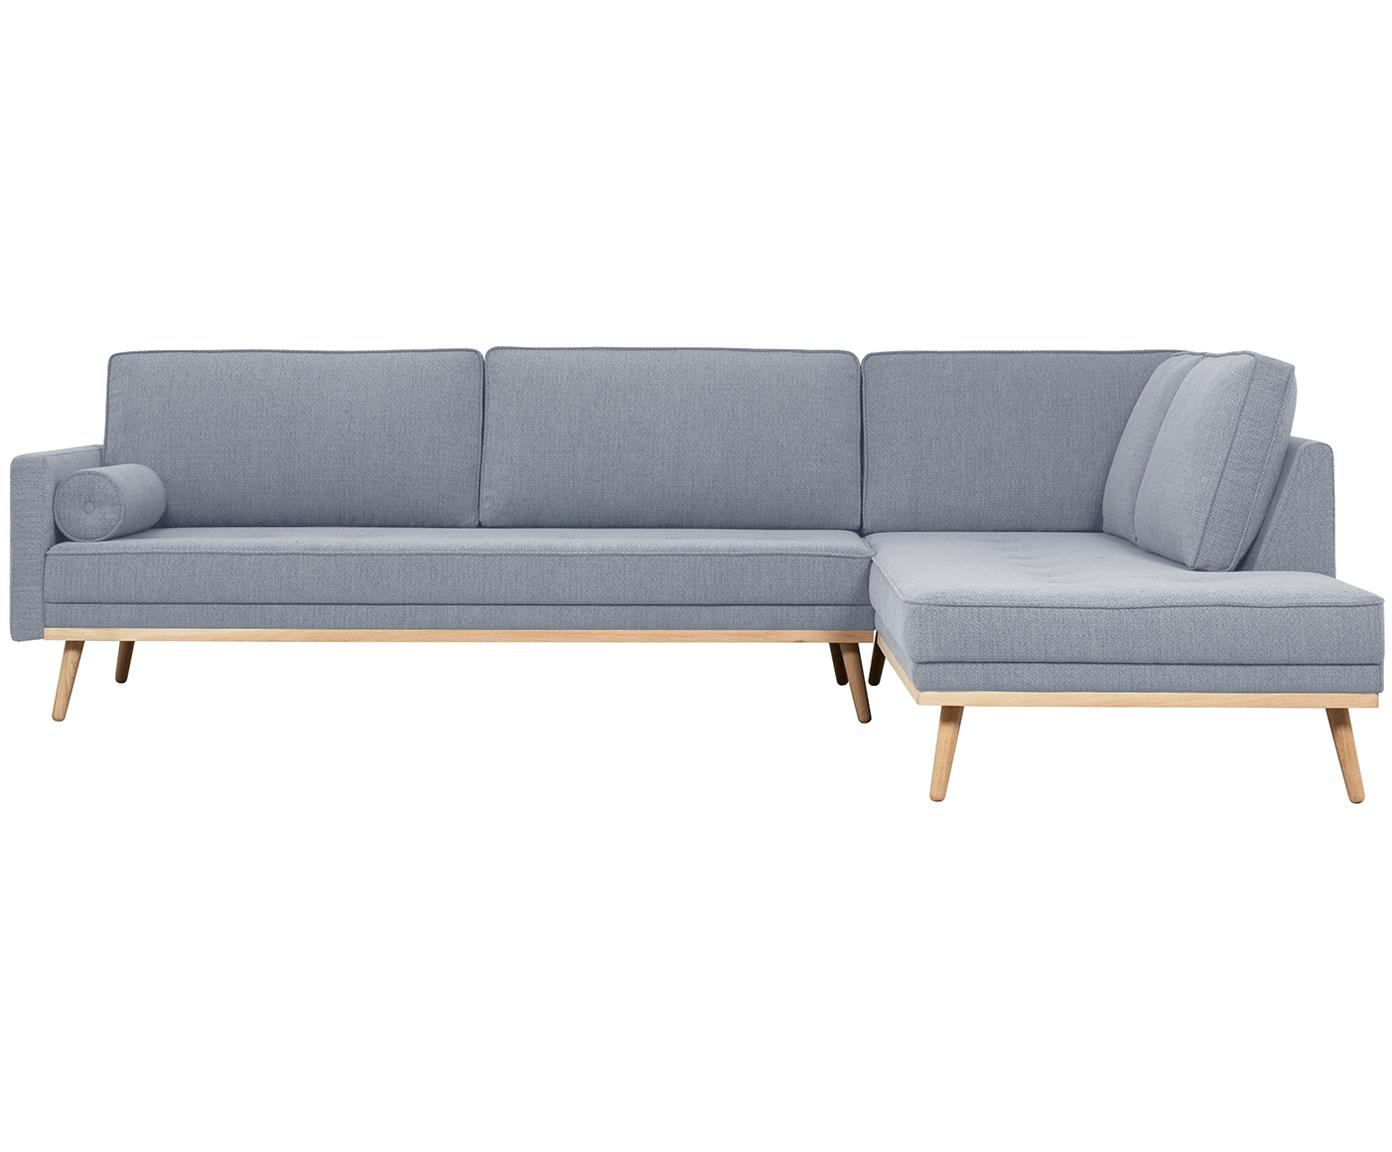 Ecksofa Saint (4-Sitzer), Bezug: Polyester 50.000 Scheuert, Gestell: Massives Kiefernholz, Spa, Blaugrau, 294 x 70 cm